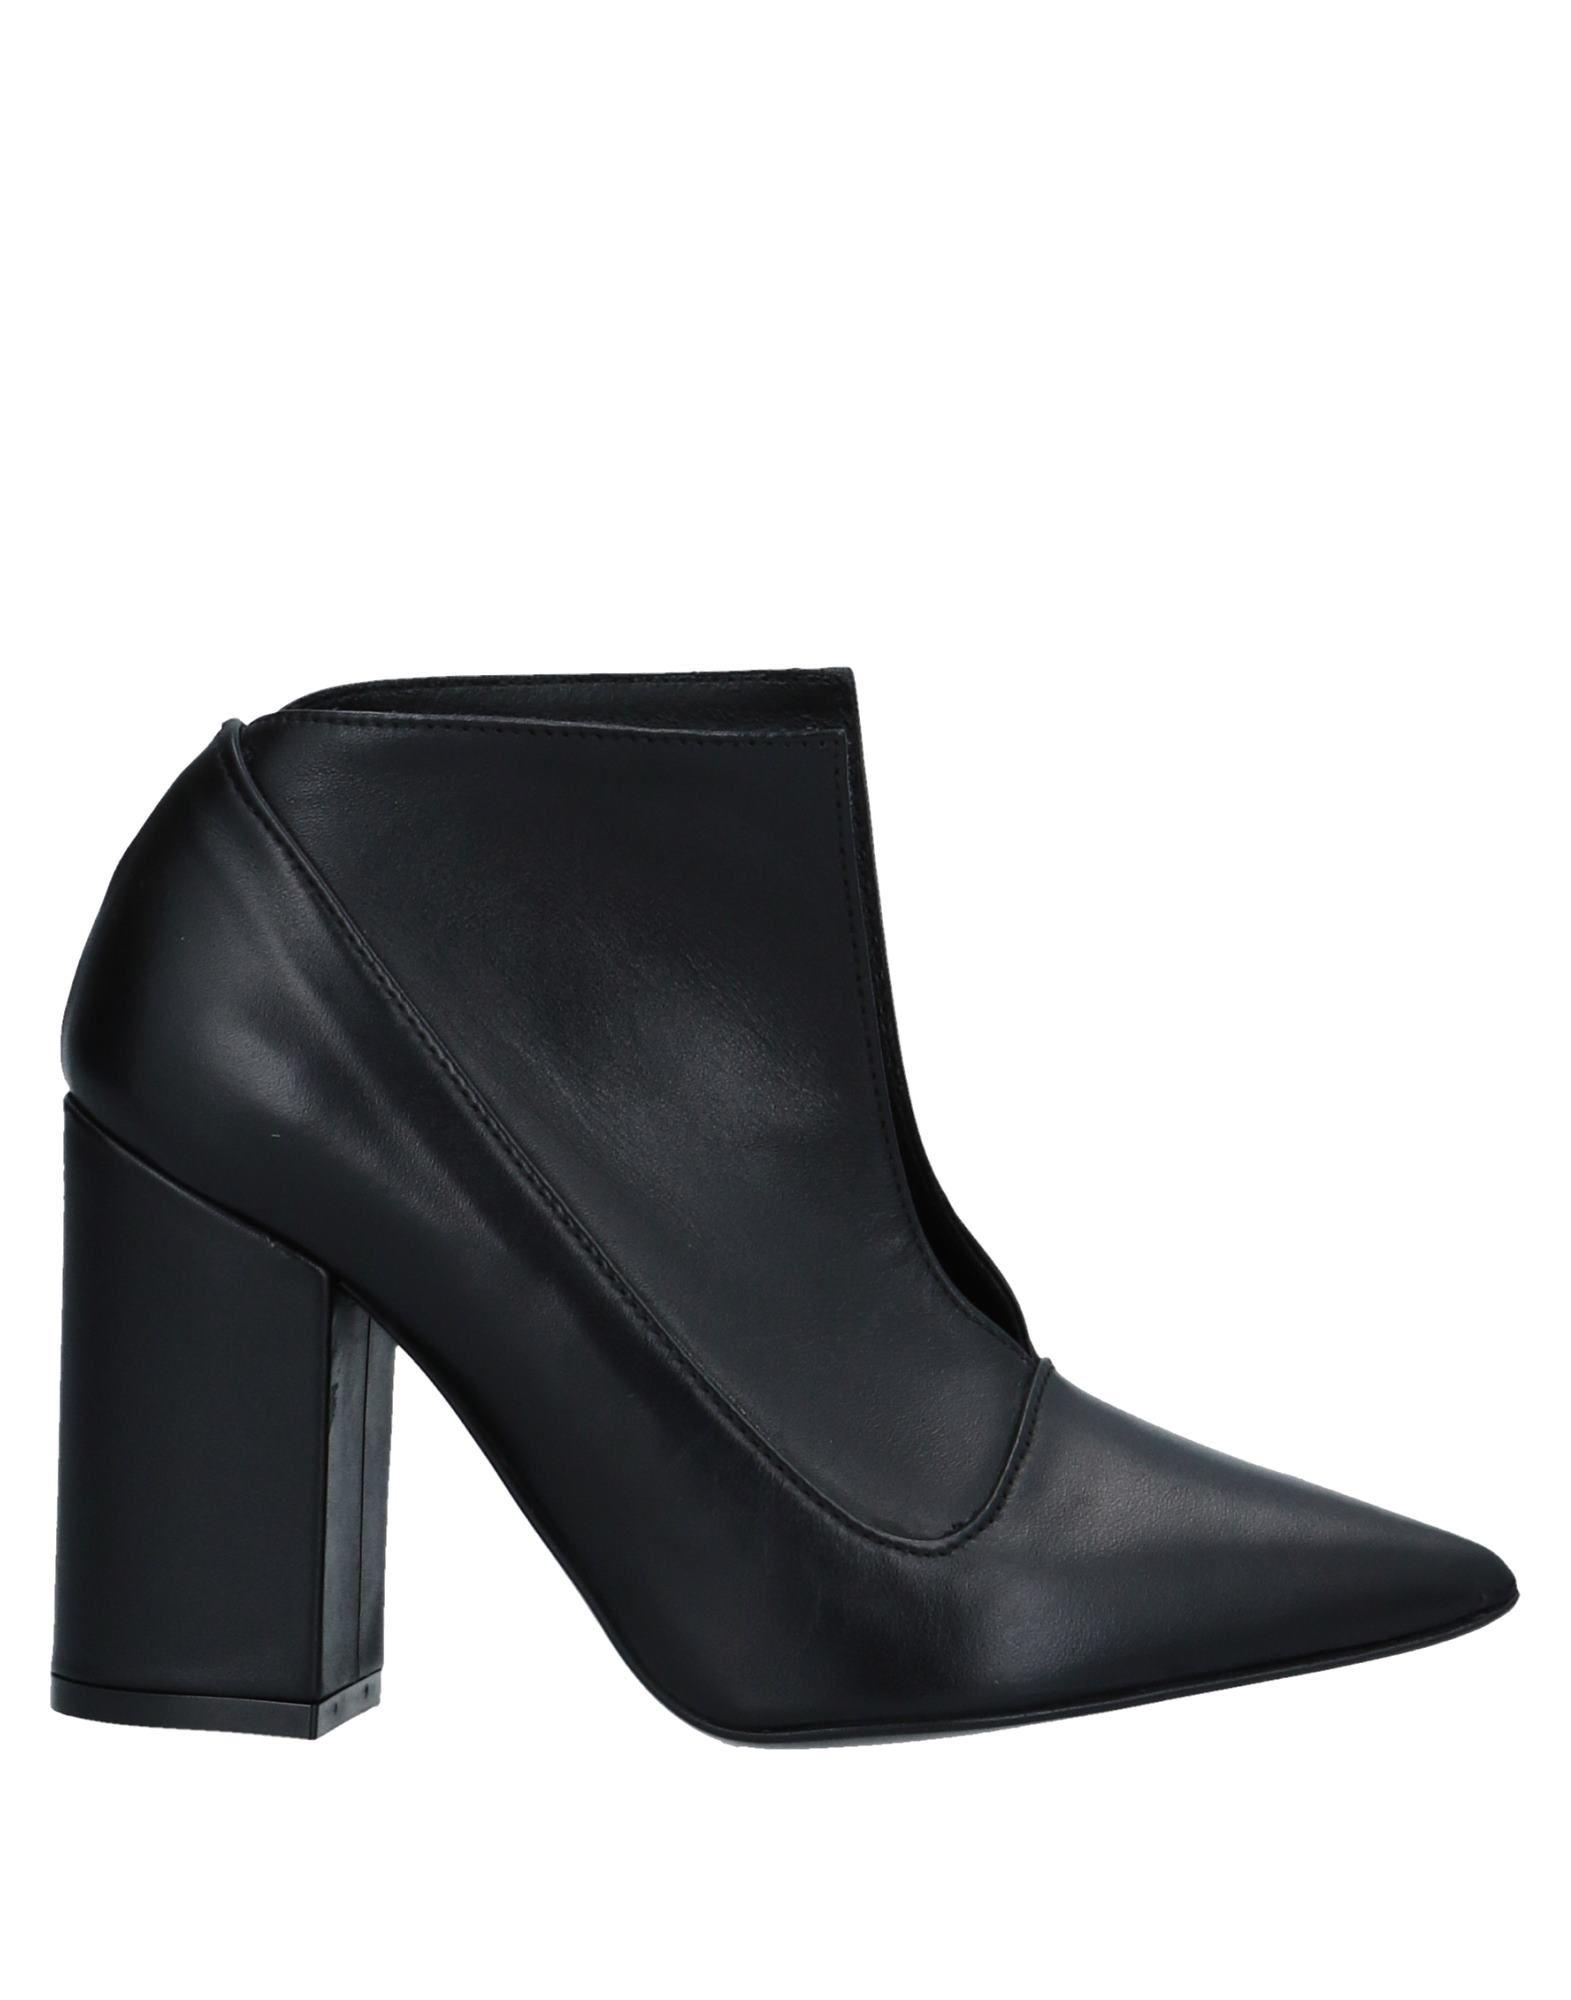 Claudia Miller Ankle Boot - Women online Claudia Miller Ankle Boots online Women on  Australia - 11533374UL 323408